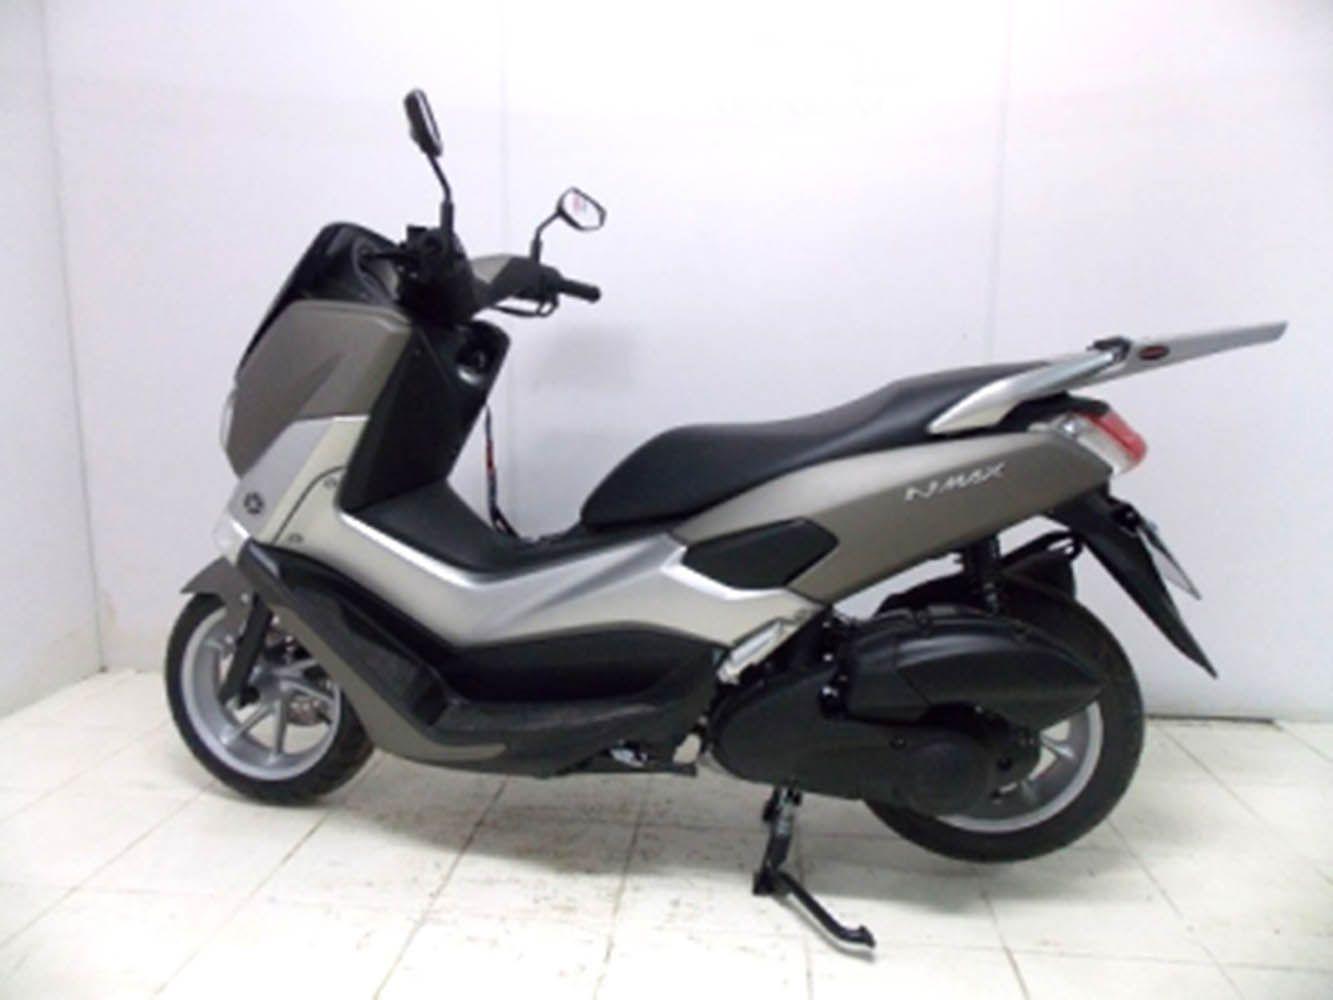 Bagageiro Suporte Bau Yamaha Nmax 160 Prata Chapam 10251